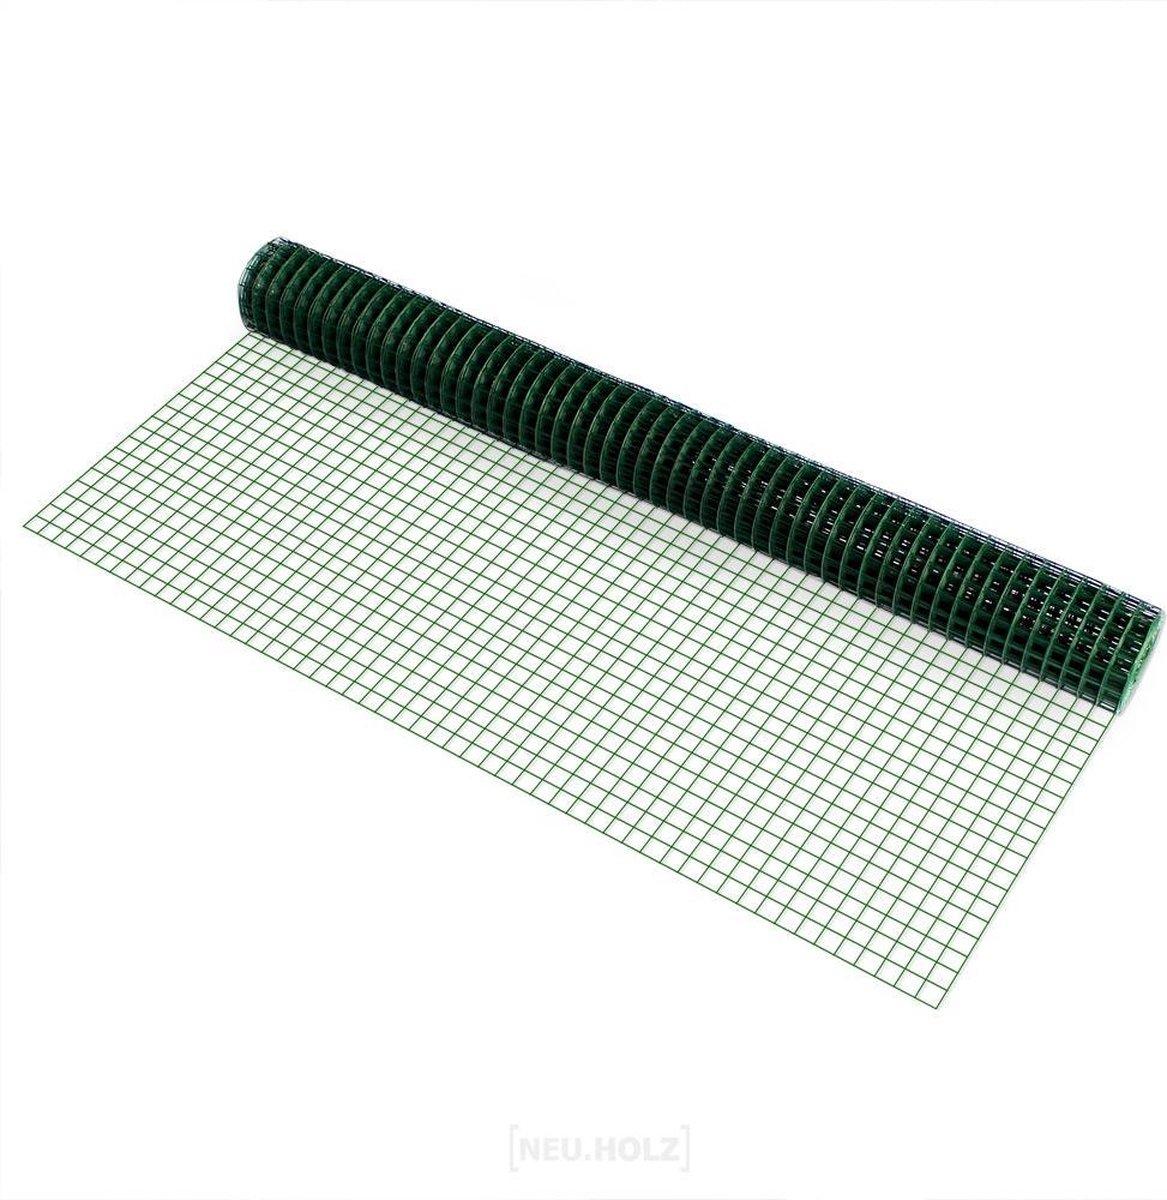 Kippengaas vierkant 19 mm geplastificeerd op rol 1x5 m groen